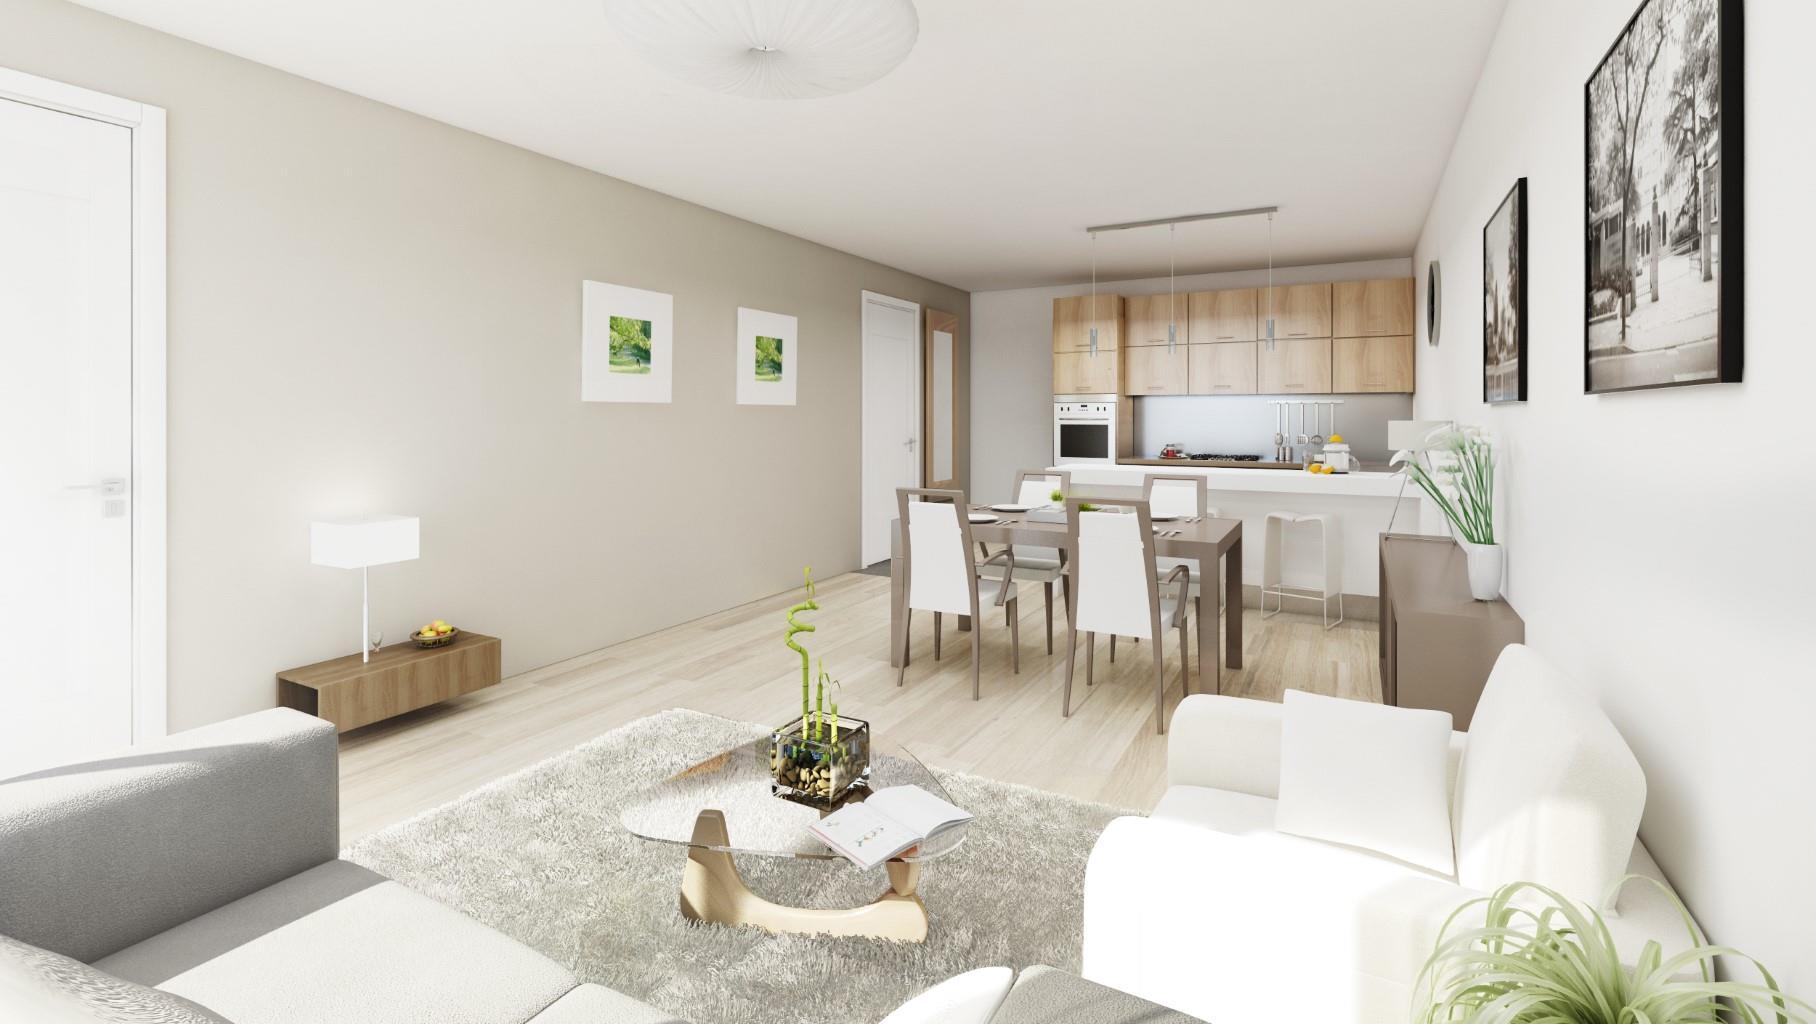 Appartement - Court-Saint-Etienne - #3171783-4